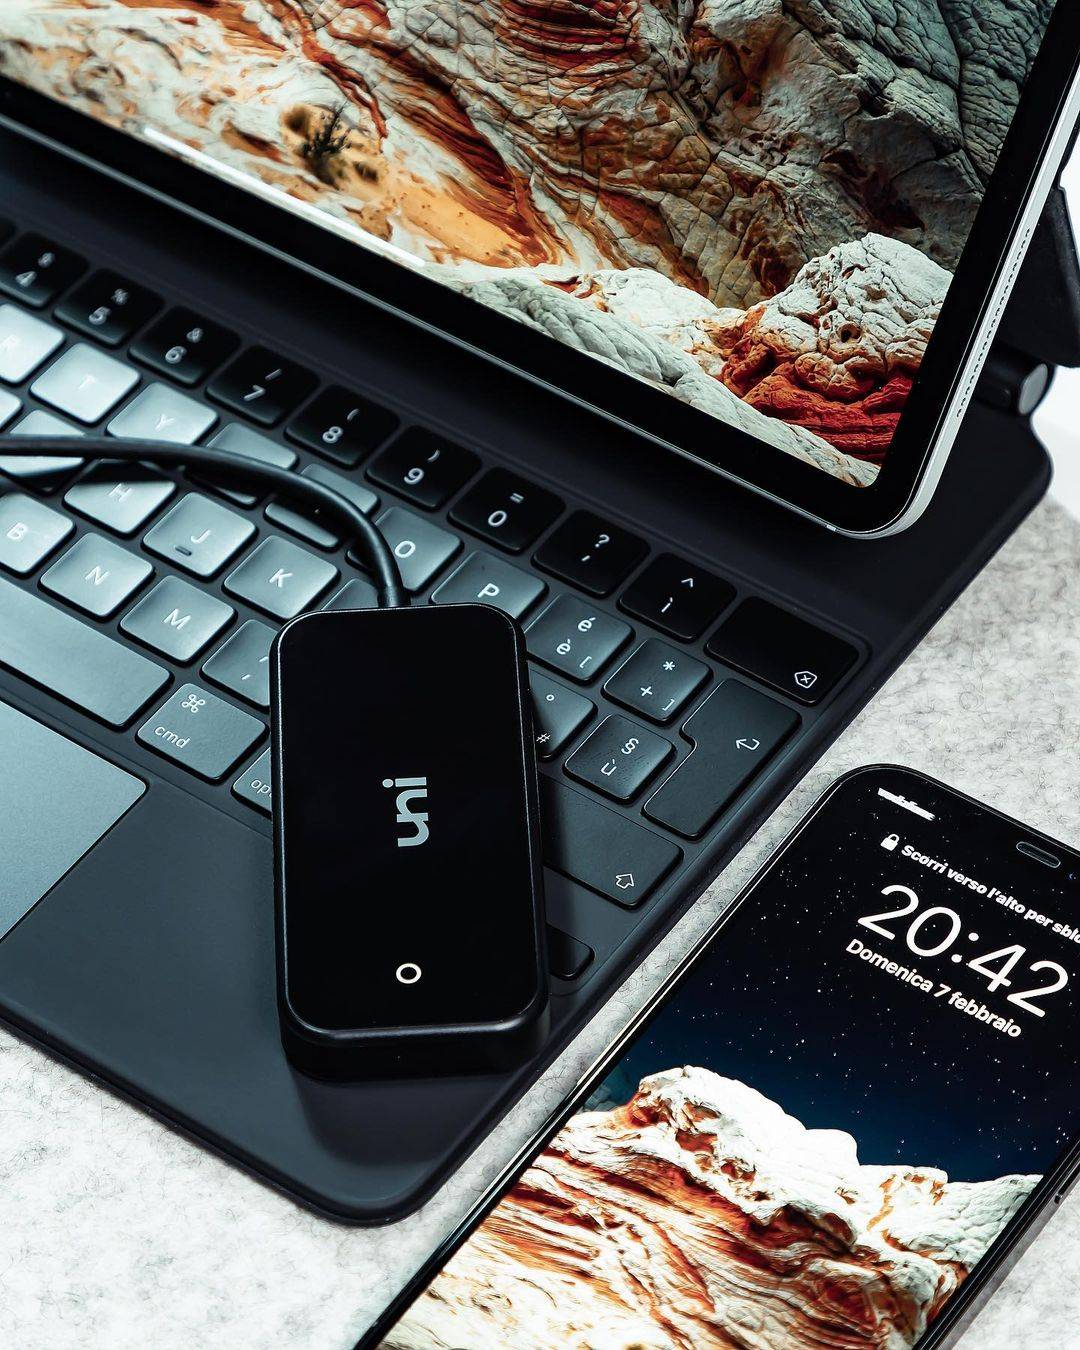 USB C HUB, USB C hub HDMI, usb hub type c, usb c hub macbook air, uni usb c hub, usb hub for macbook pro